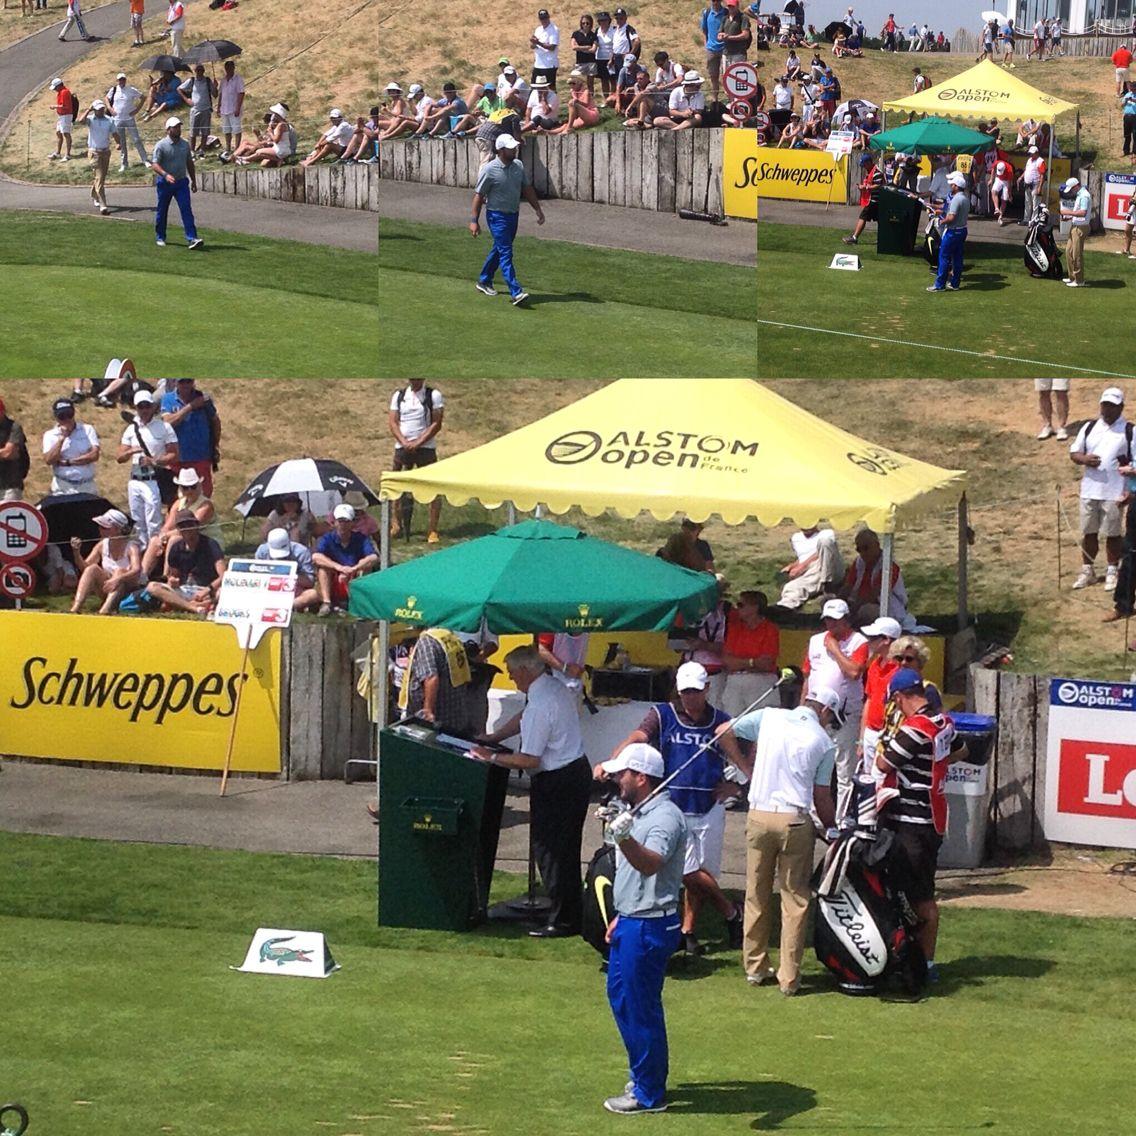 Molinari alla buca 1  #raimondi #raimondigolfshoes #golfshoes #opendefrance #madeinitaly #handmadeinitaly #alstomopendefrance